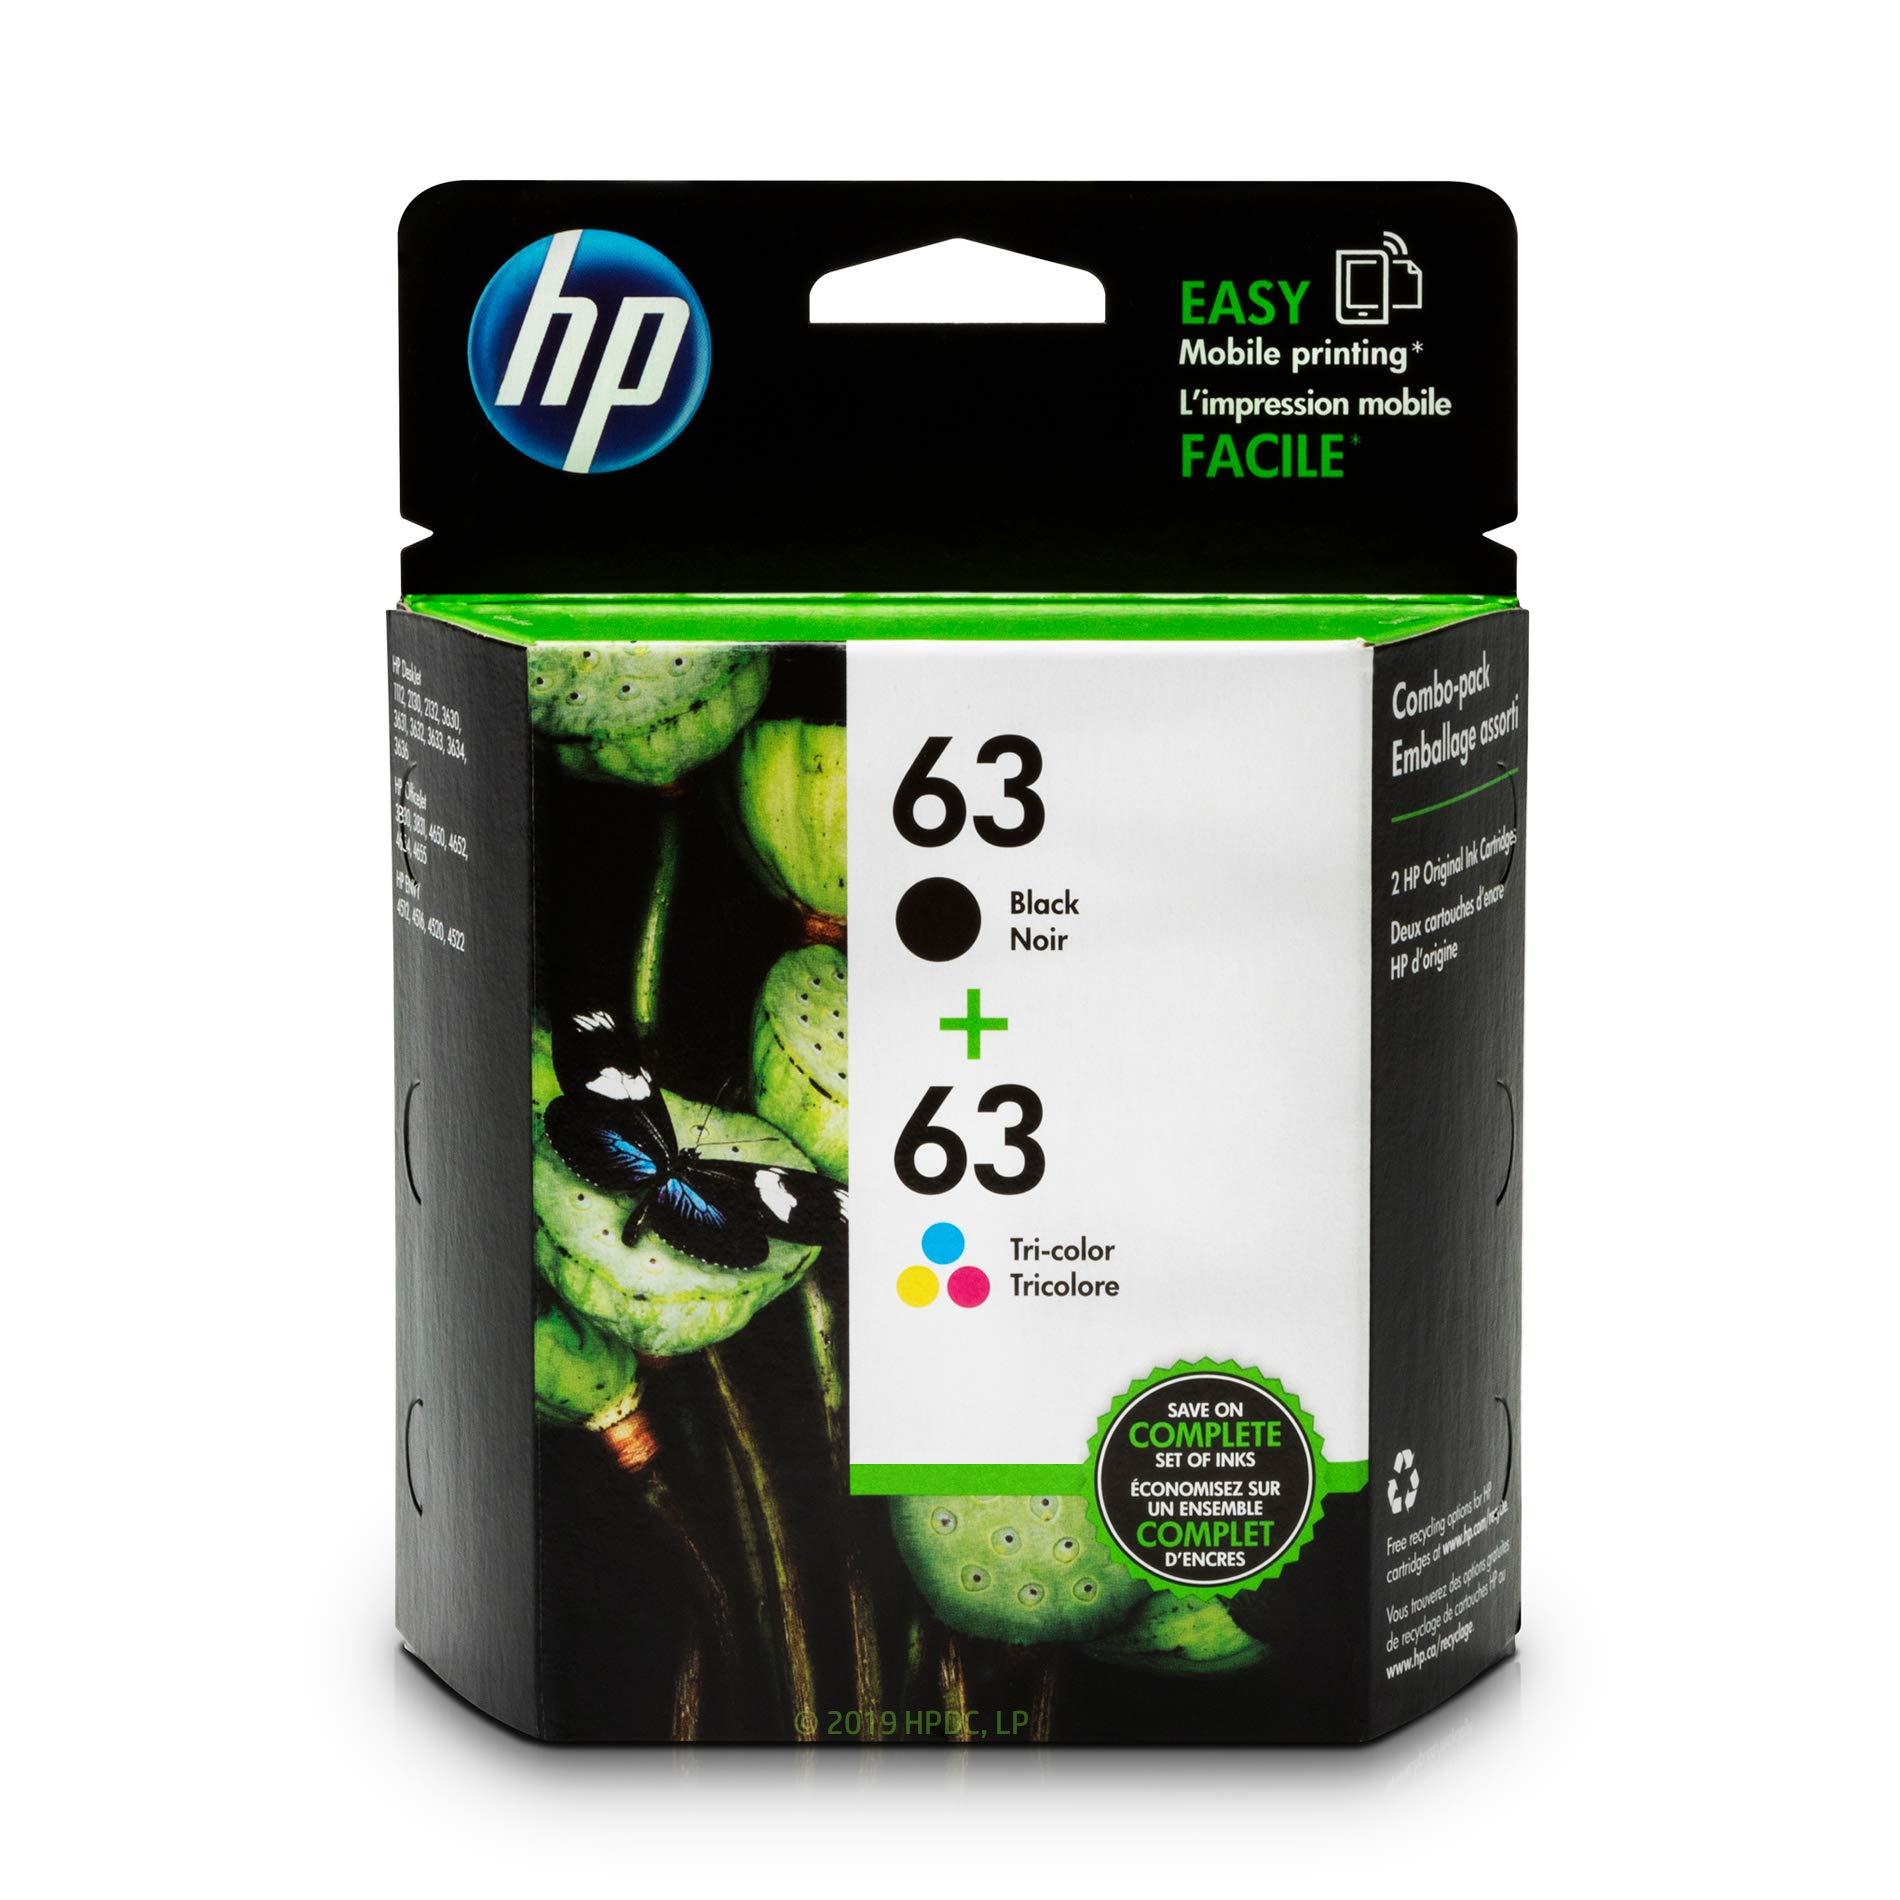 HP 63   2 Ink Cartridges   Black, Tri-color   F6U61AN, F6U62AN by HP